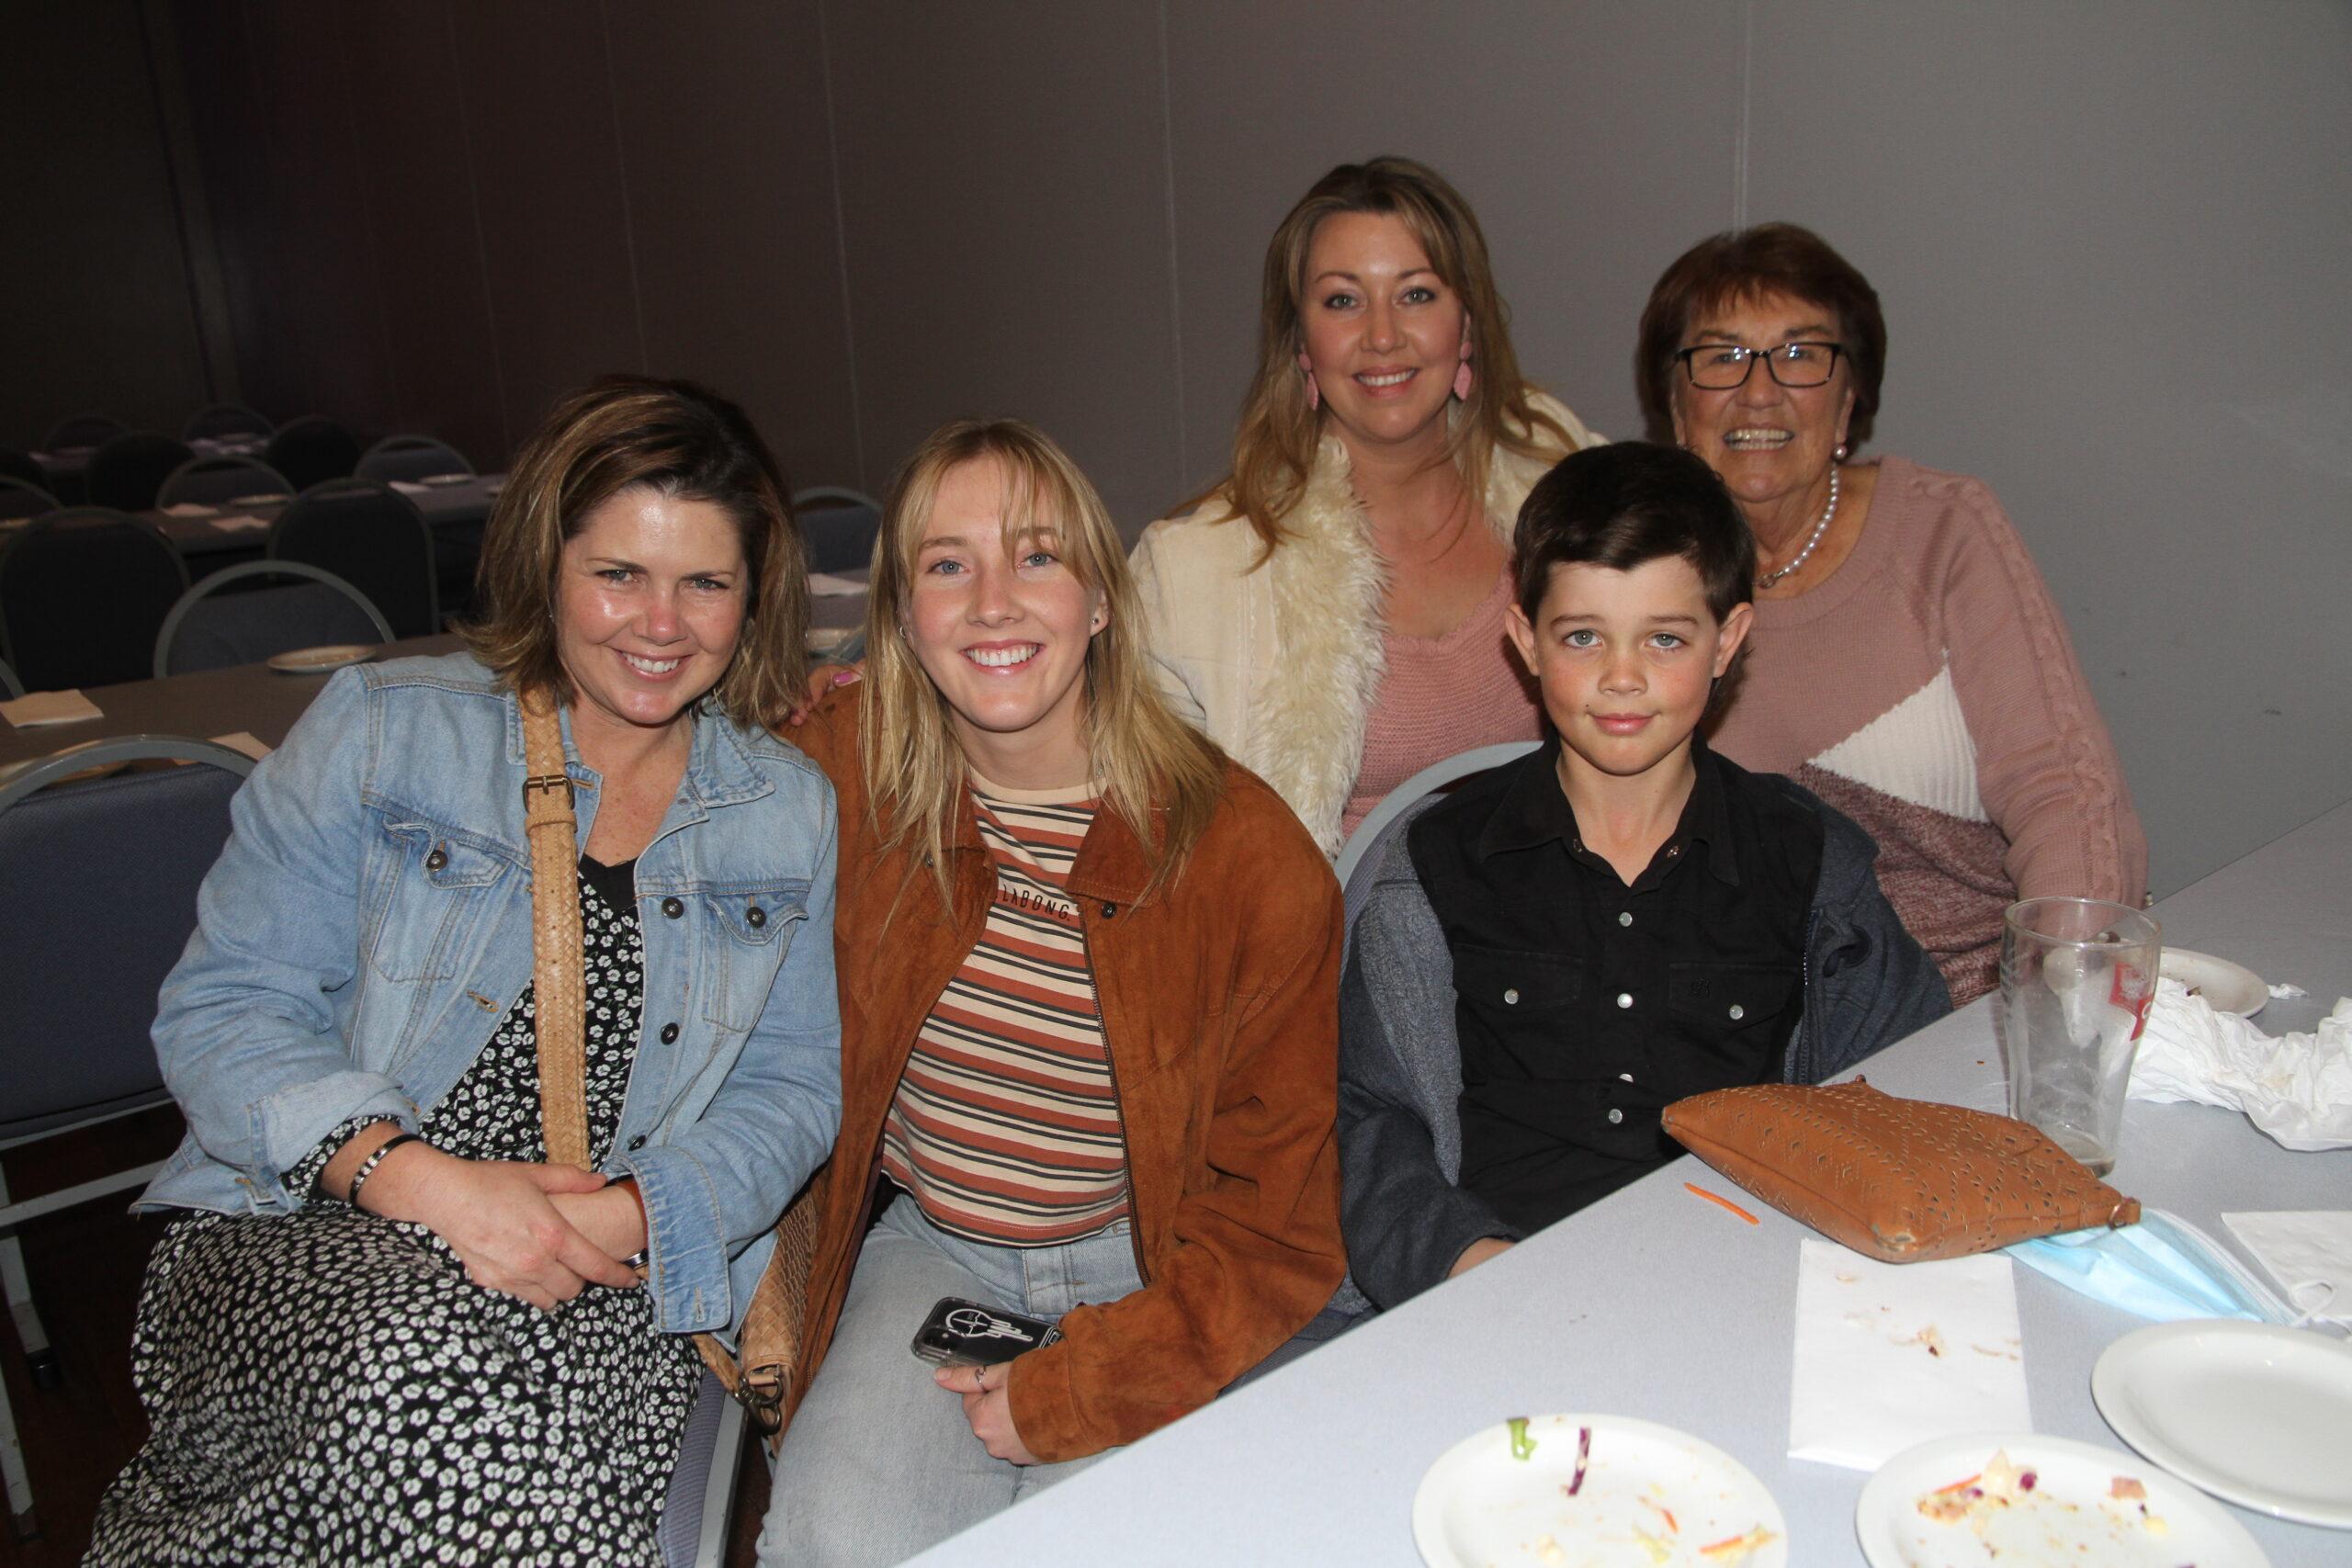 Cassie Dickinson, Clariese and Clarissa Ryman, Joe and Caroll Dickinson.